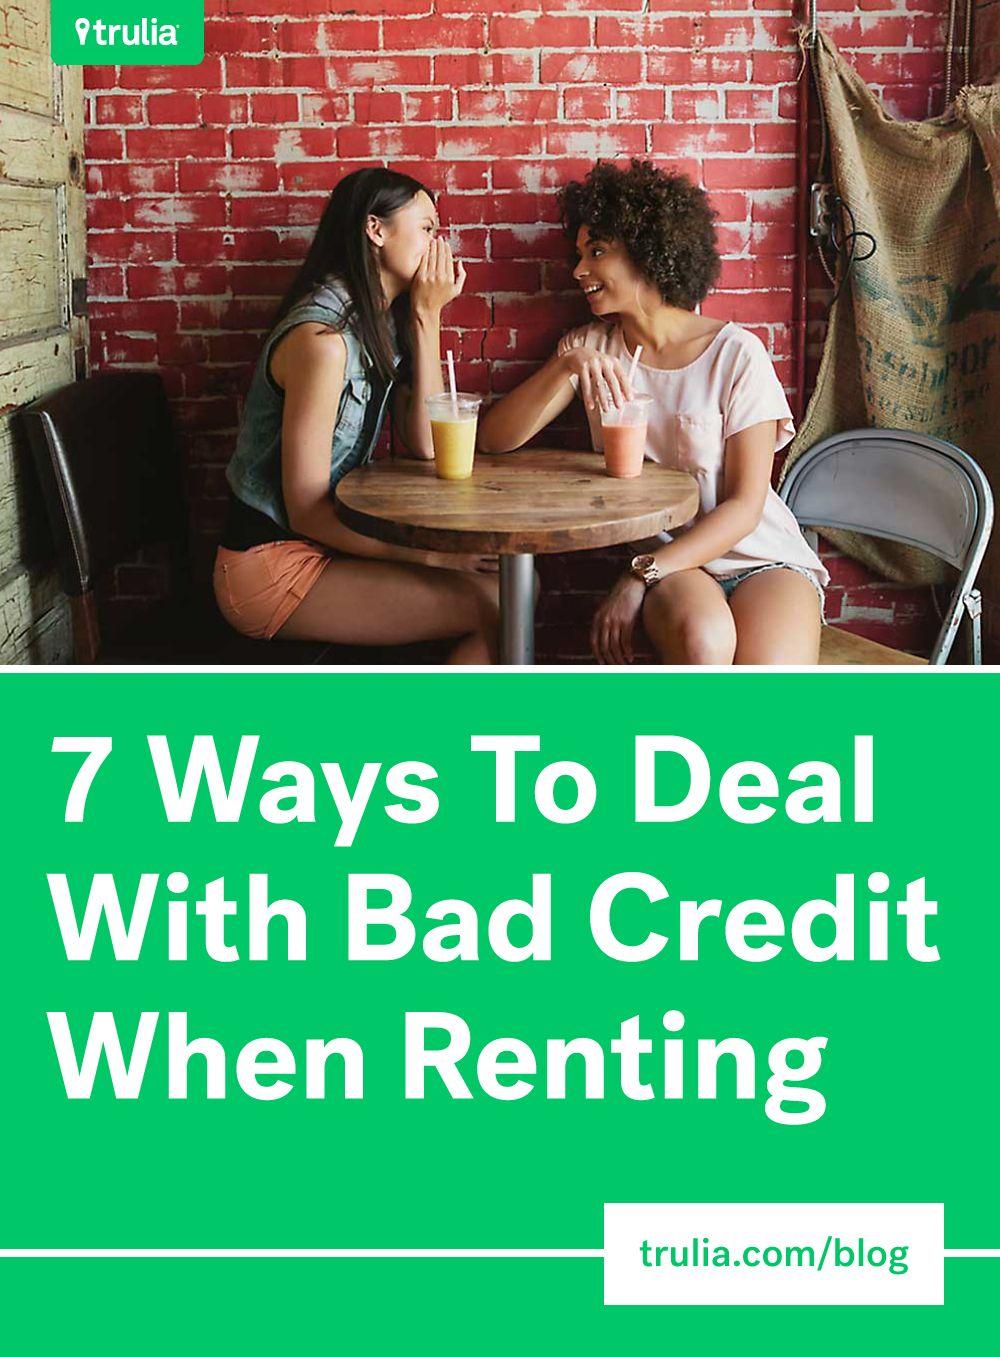 600af2202d25e8271e8945e70ed6a52b - How To Get A Rental With Bad Rental History